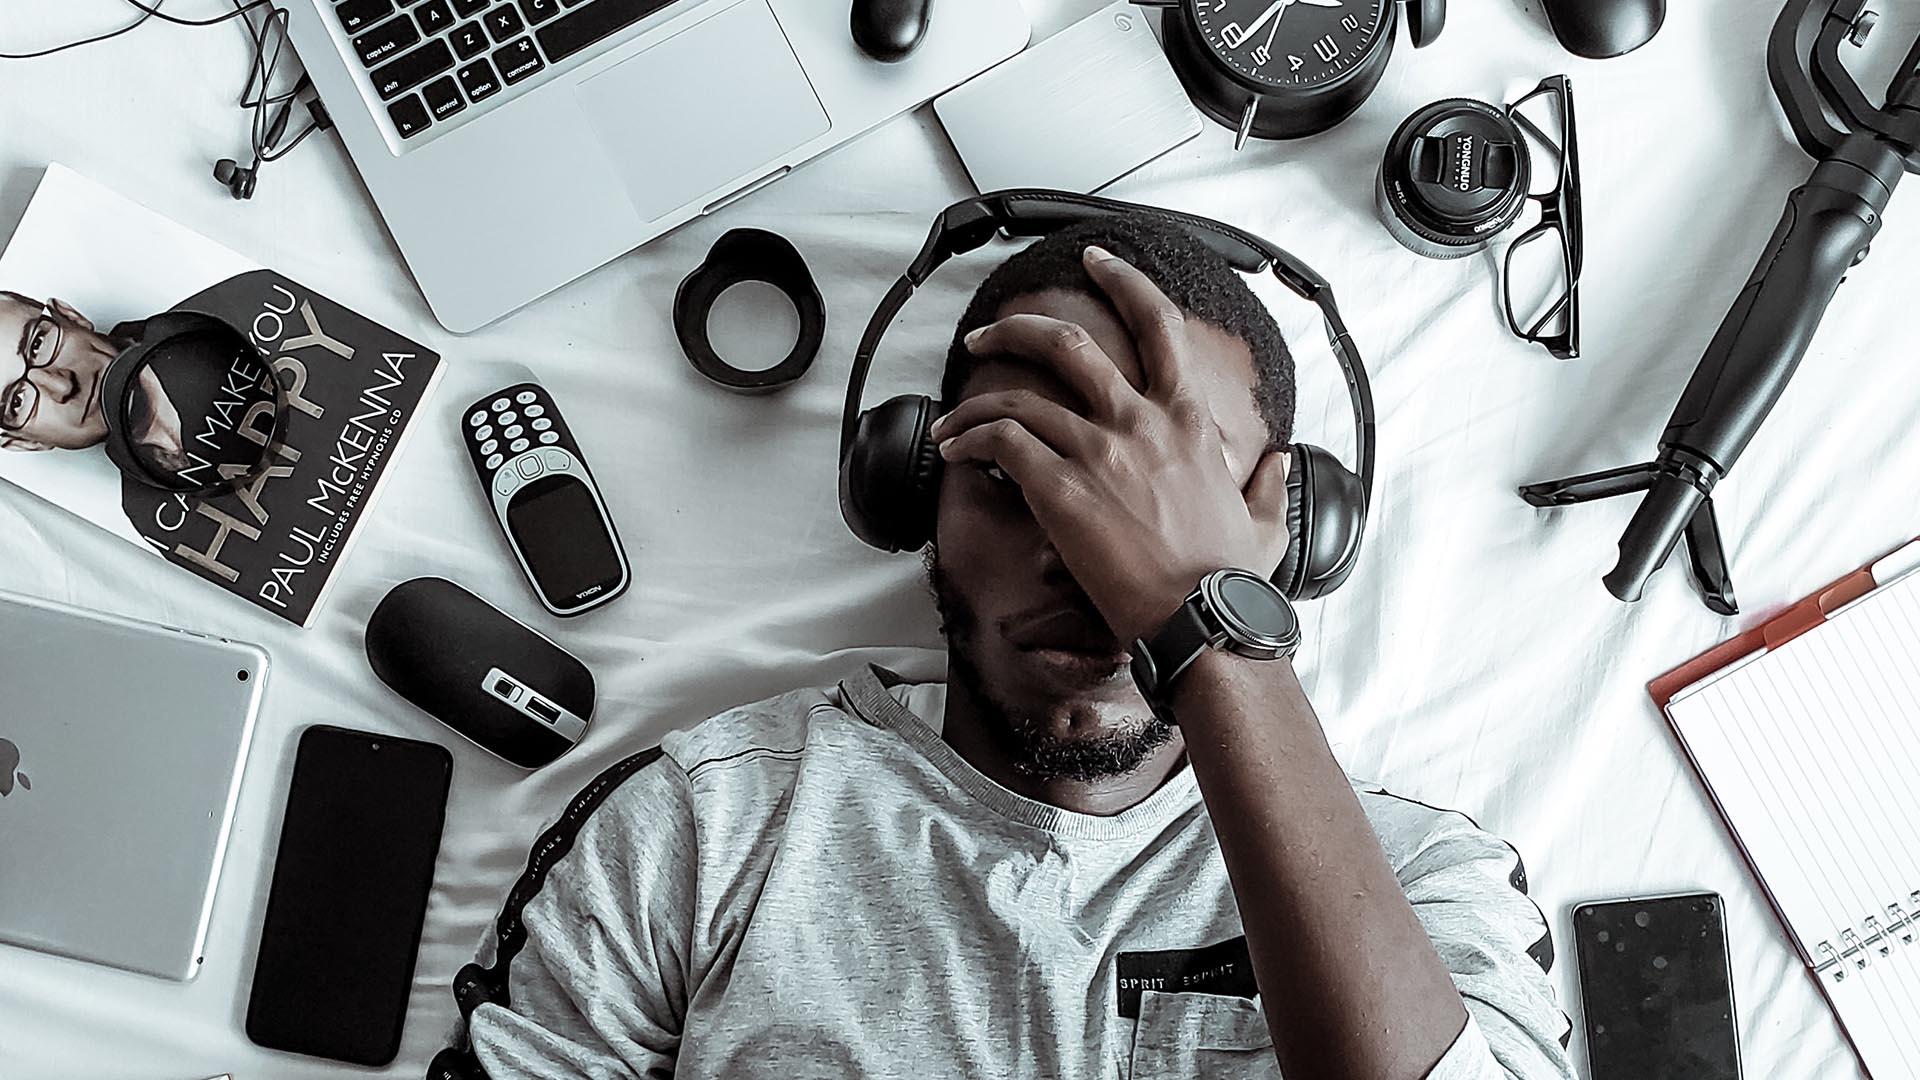 Does digital technology make students stupid?